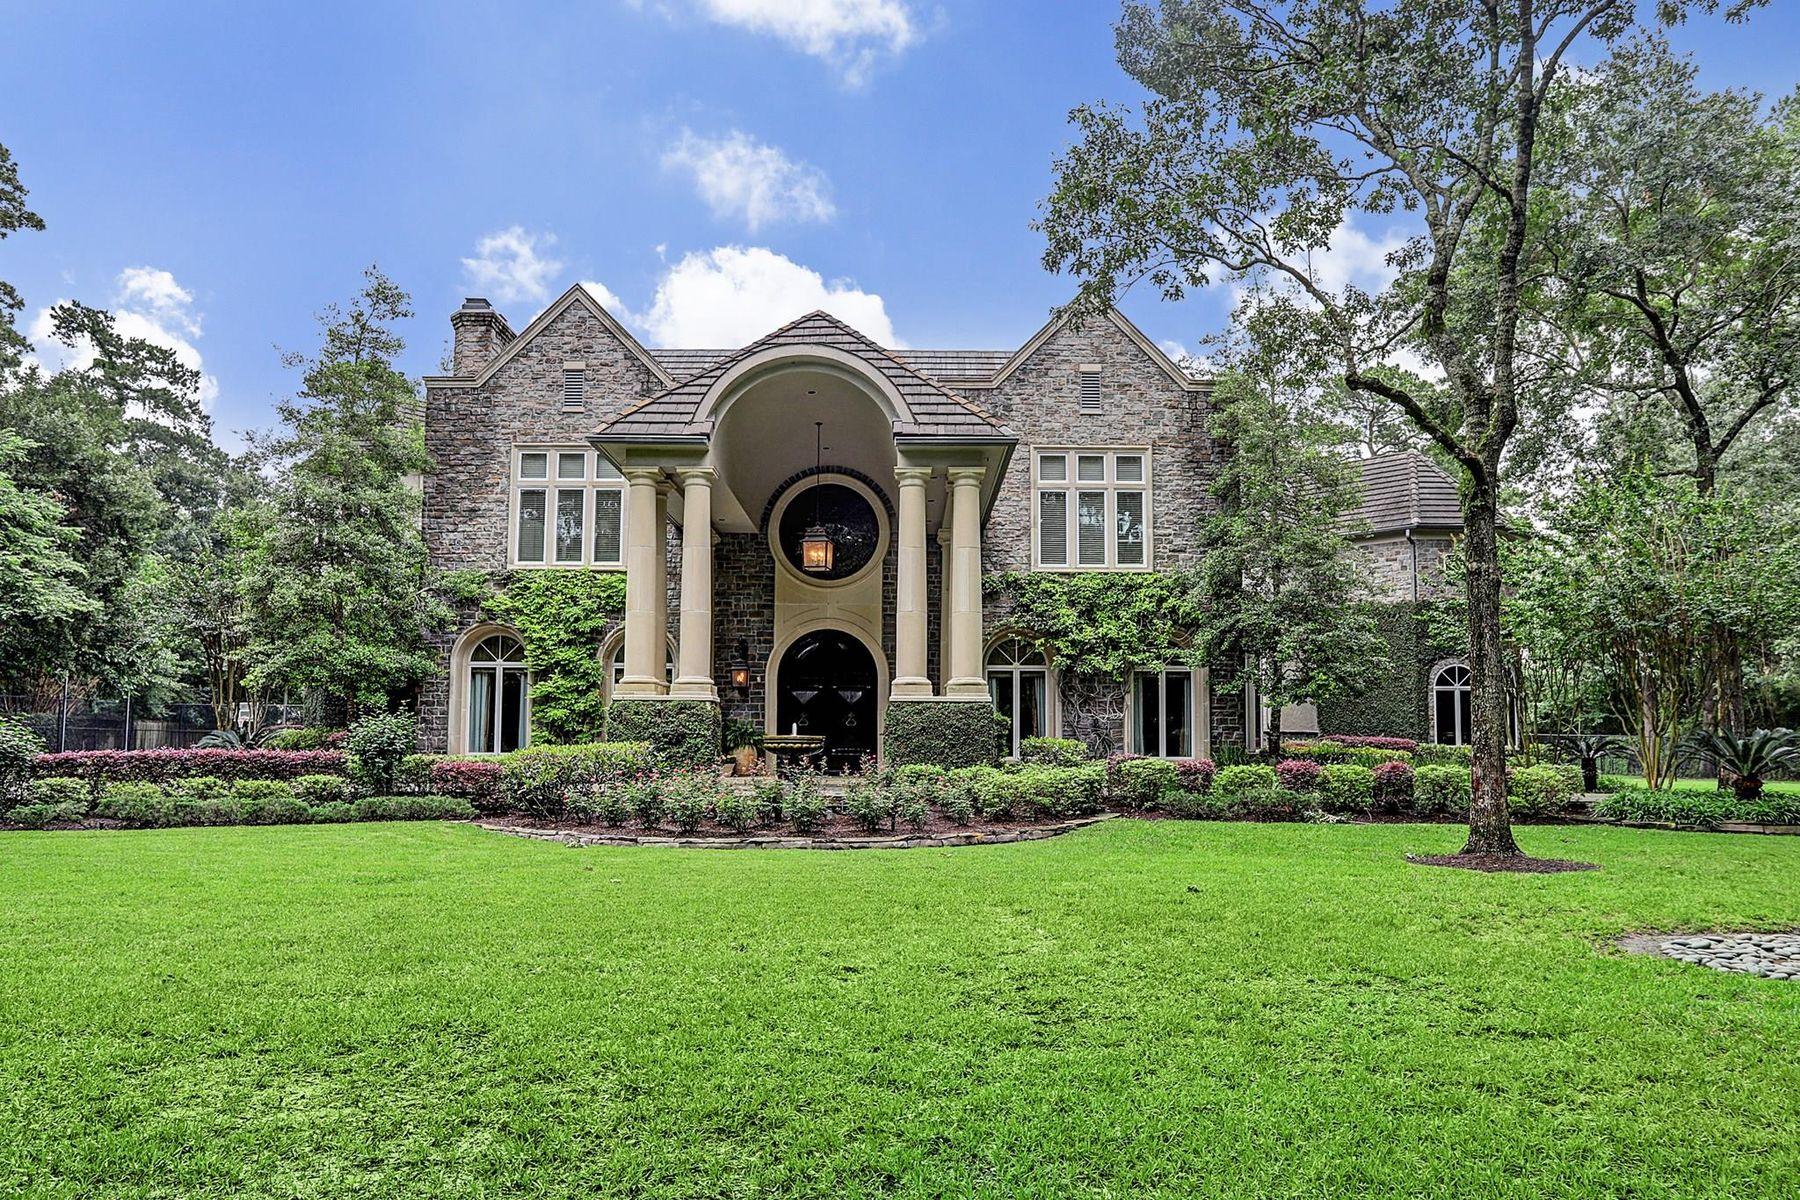 Single Family Homes for Sale at 9010 Sandringham Houston, Texas 77024 United States